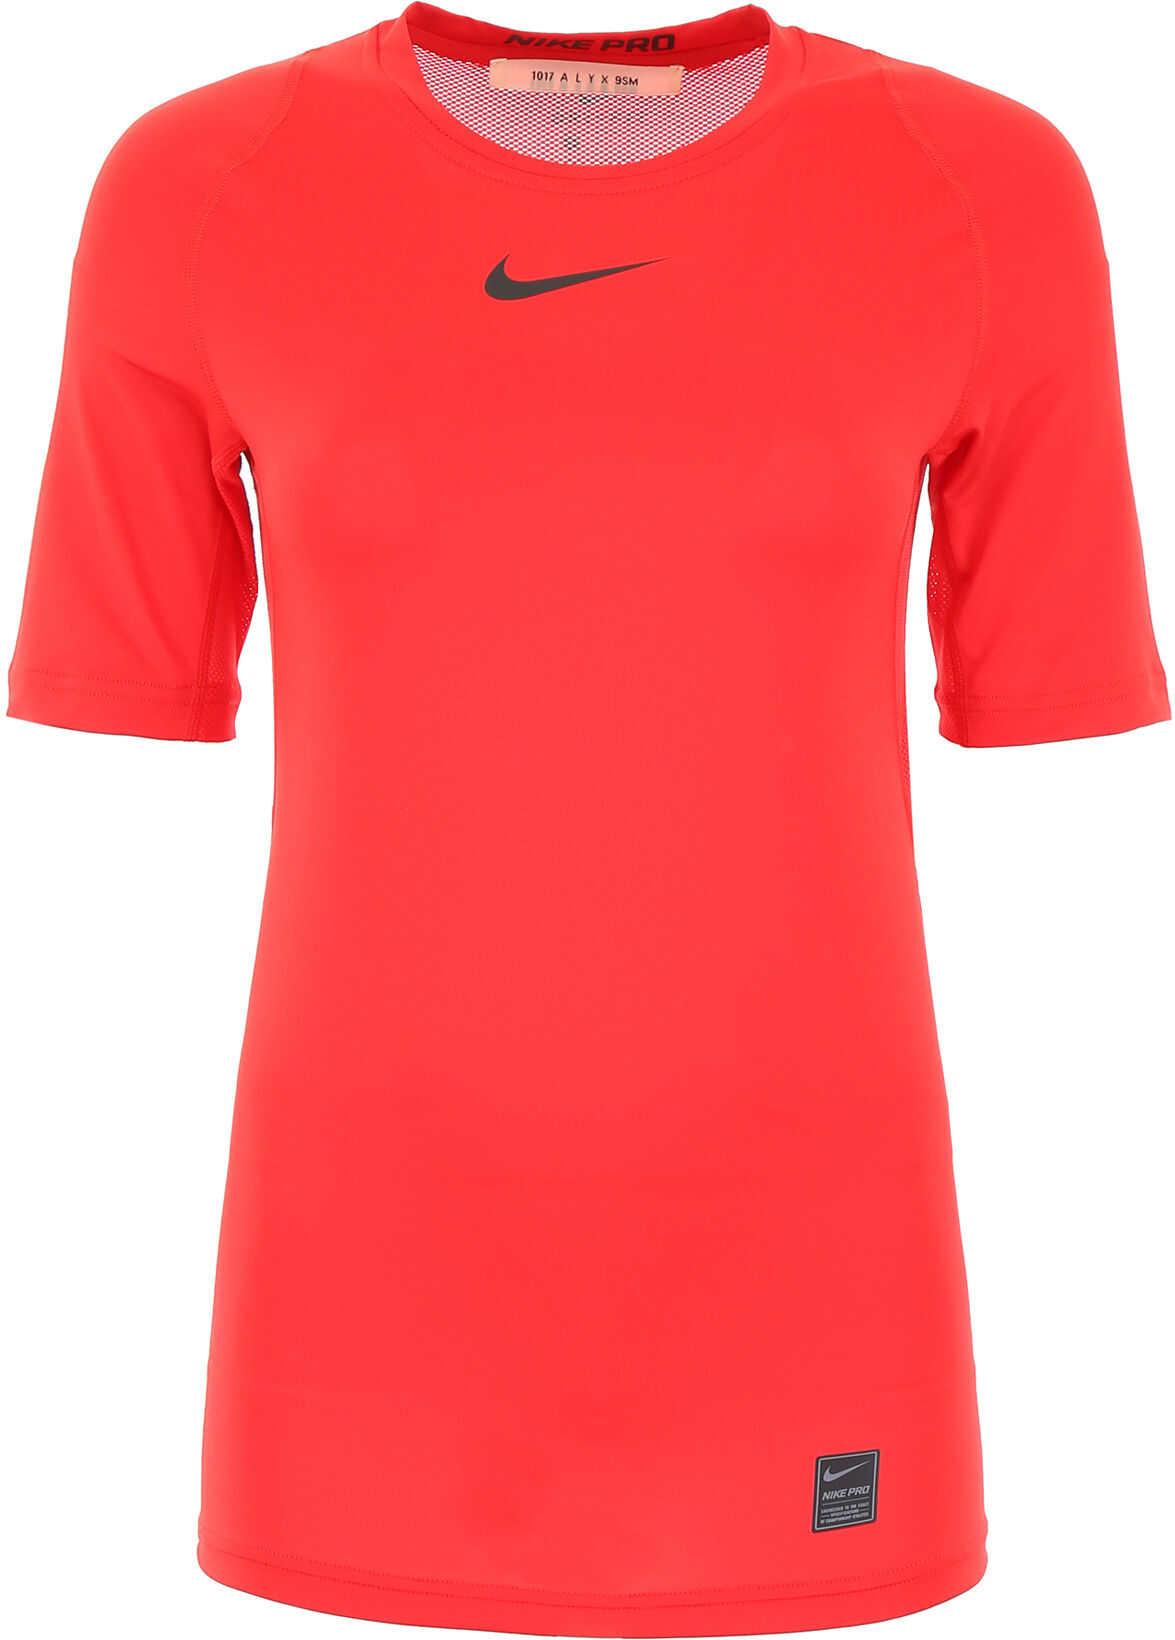 Alyx 1017 9Sm Nike Logo T-Shirt RED